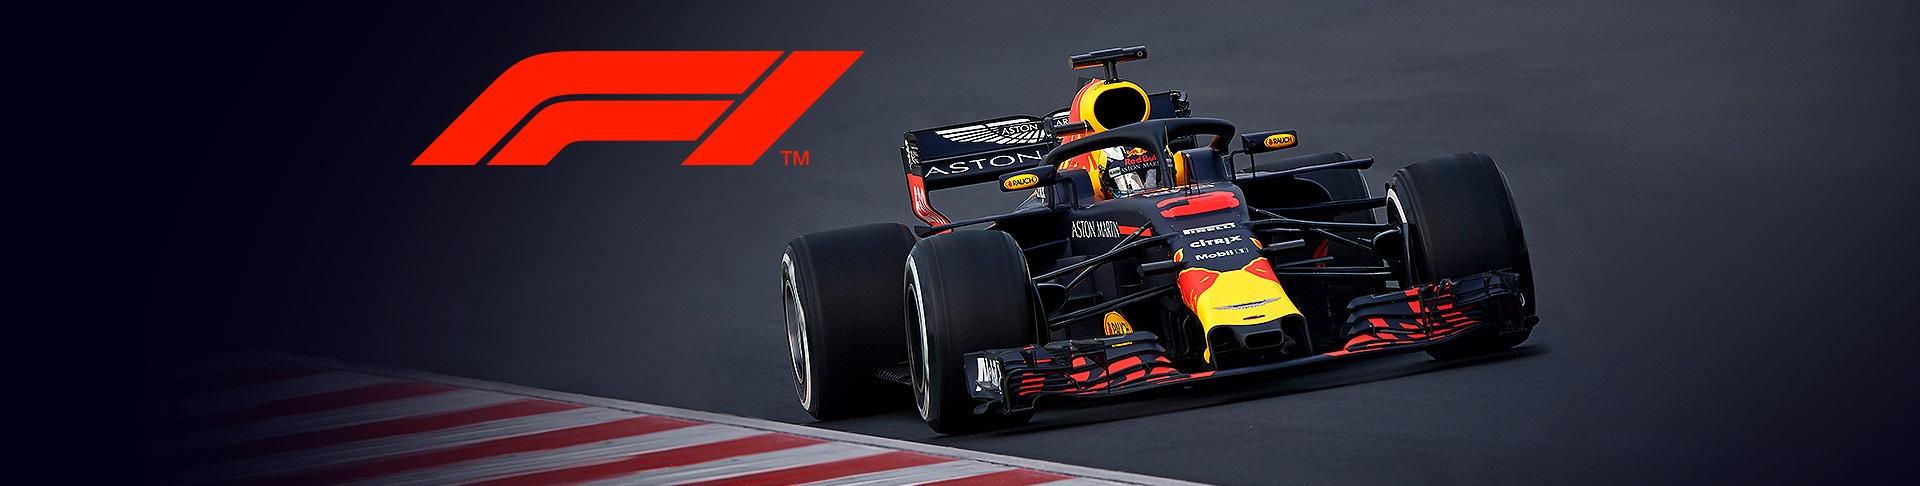 Formula 1 - Network Ten